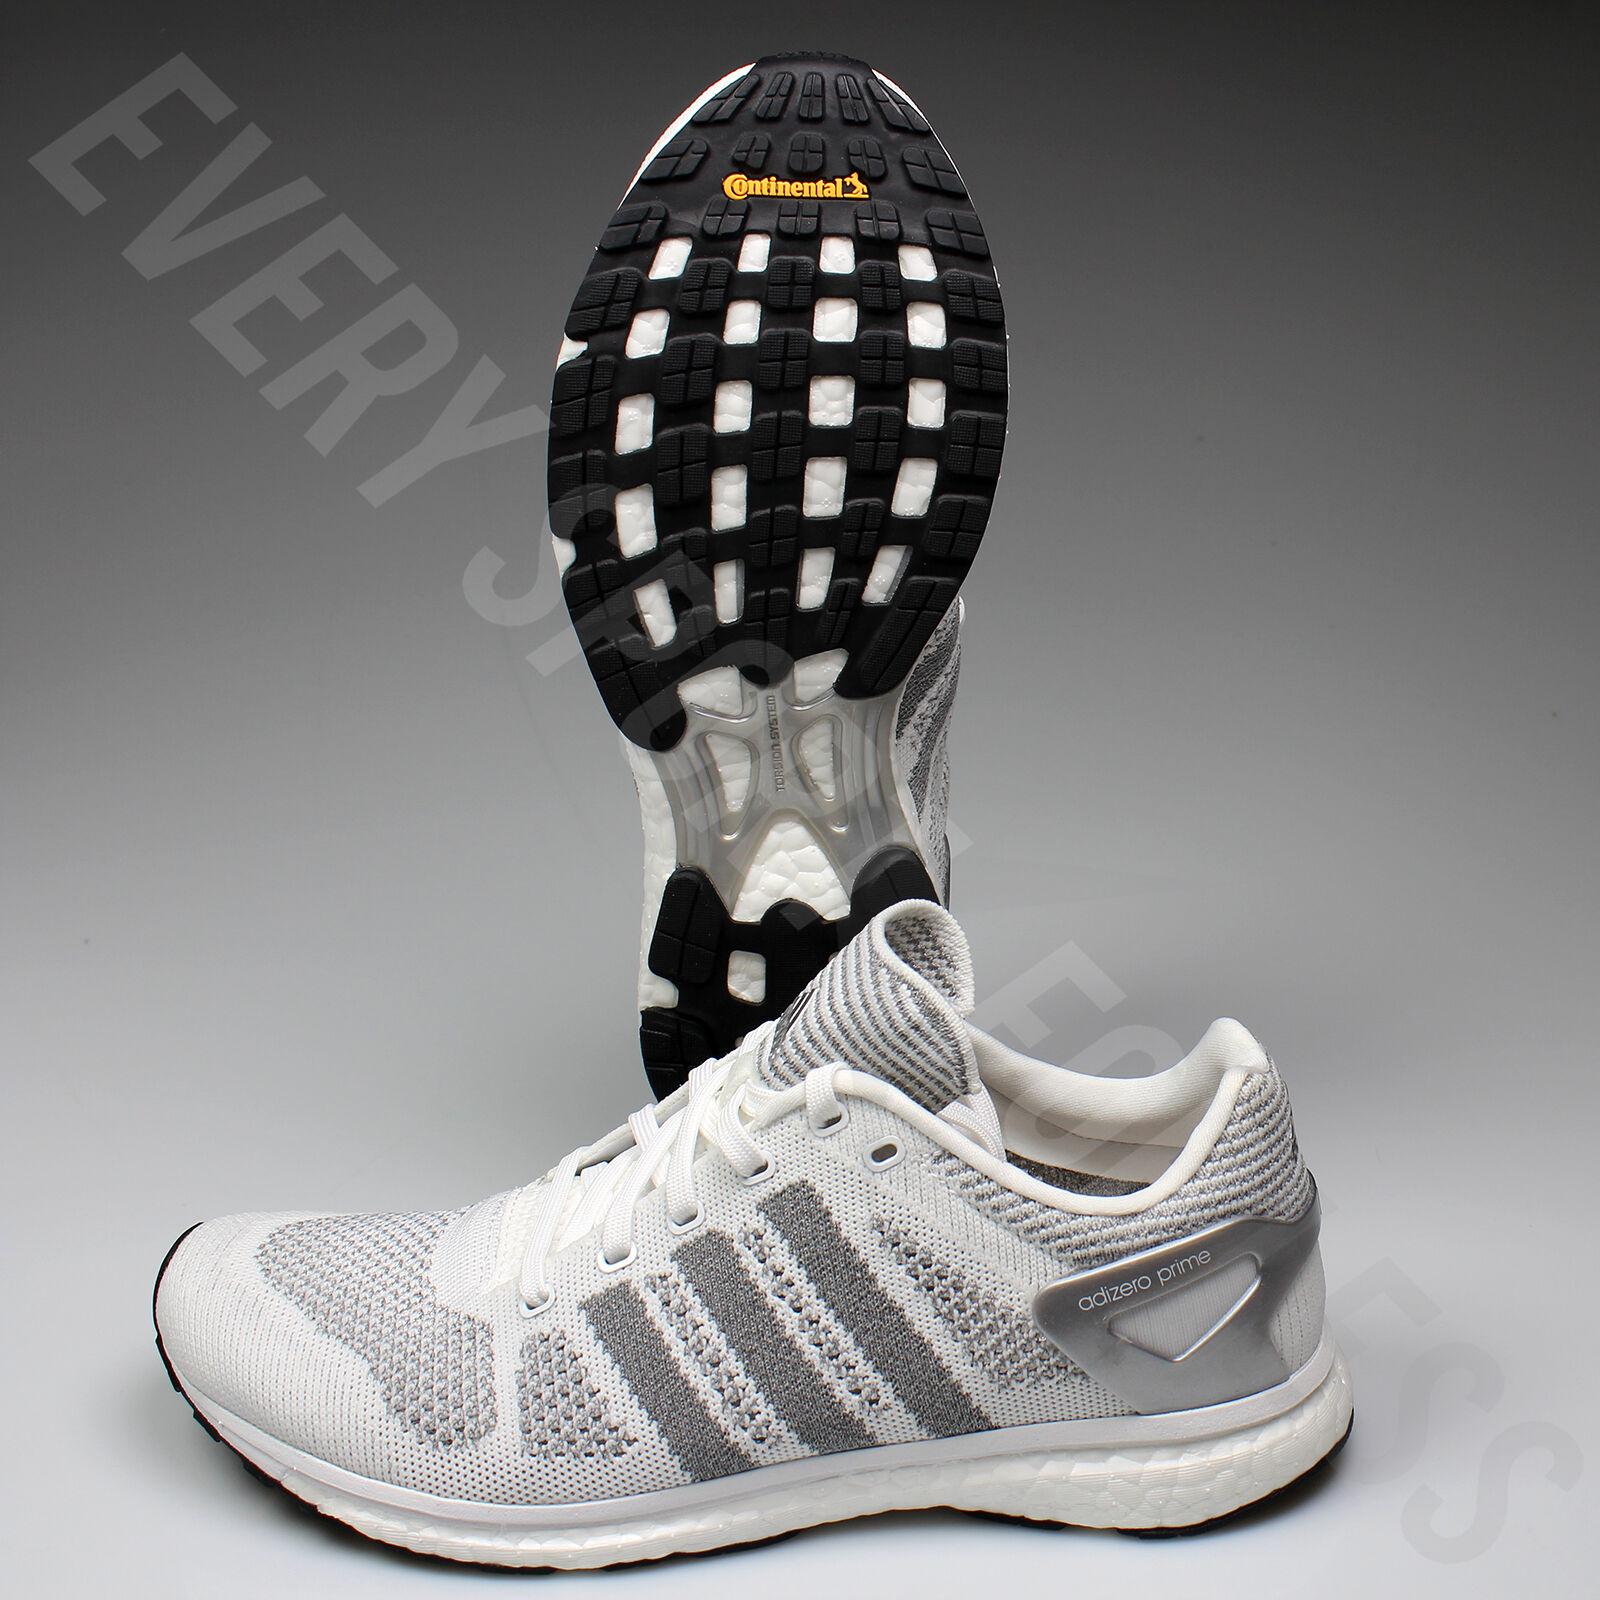 Adidas Adizero Primeknit BB4919 Mens Running shoes-Wht Sil Blk(NEW) Lists @  200